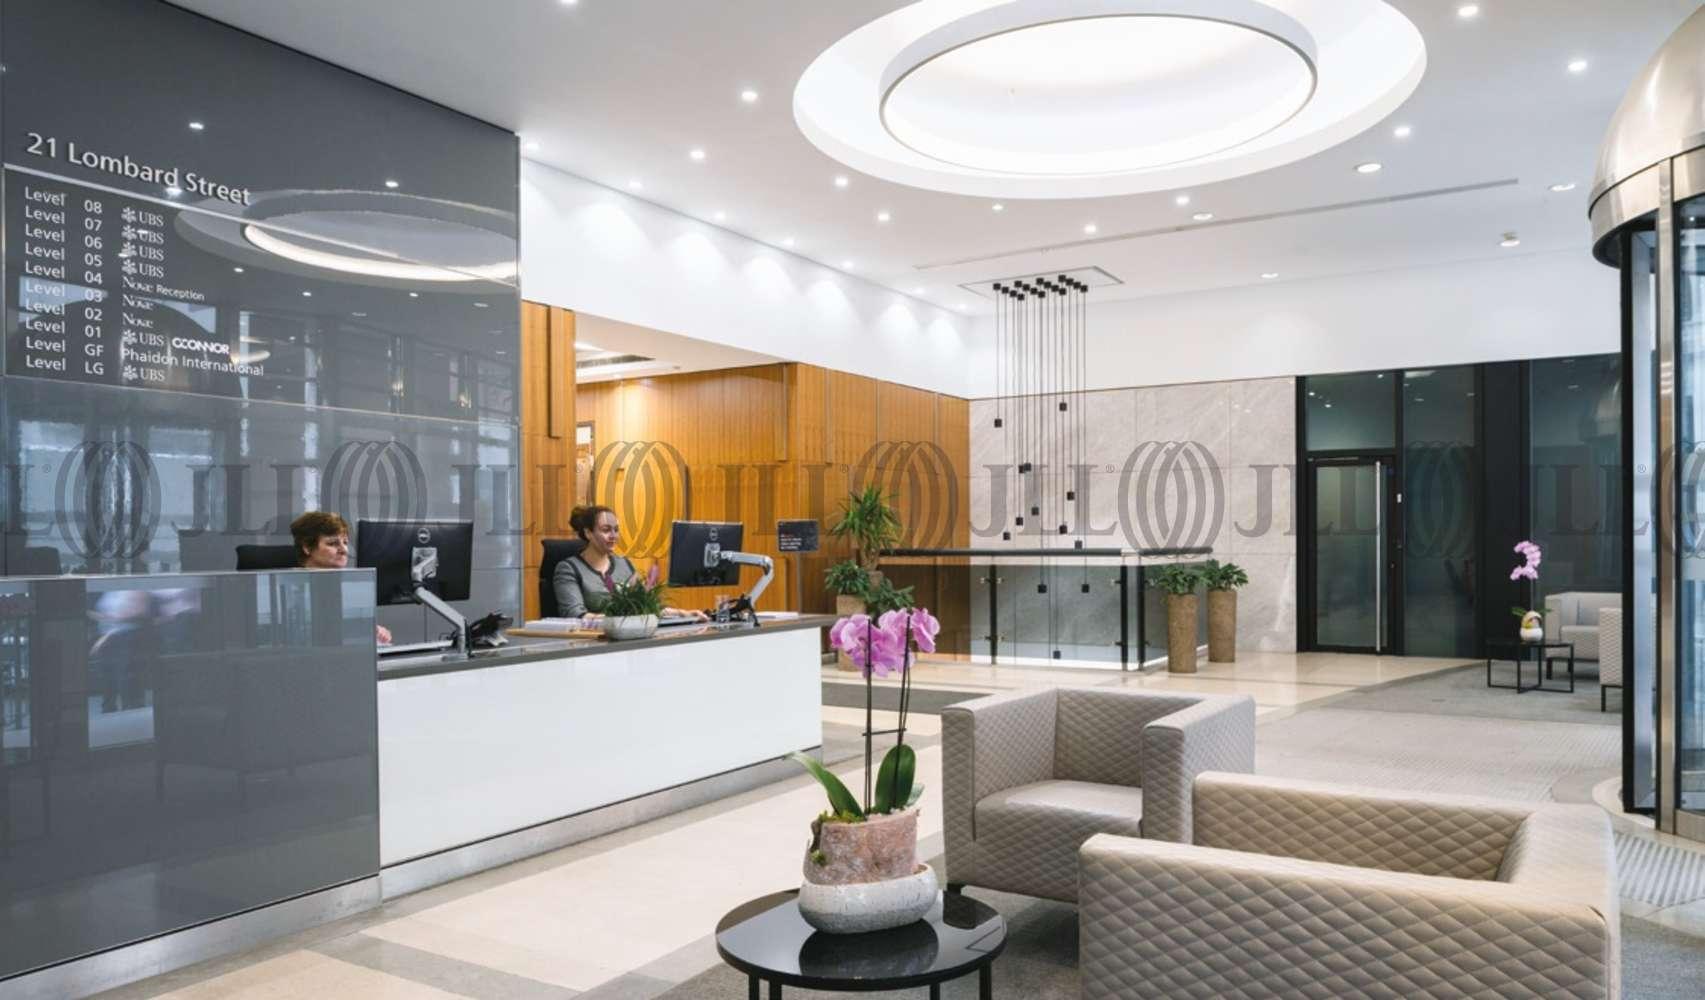 Office London, EC3V 9AH - 21 Lombard Street - 8